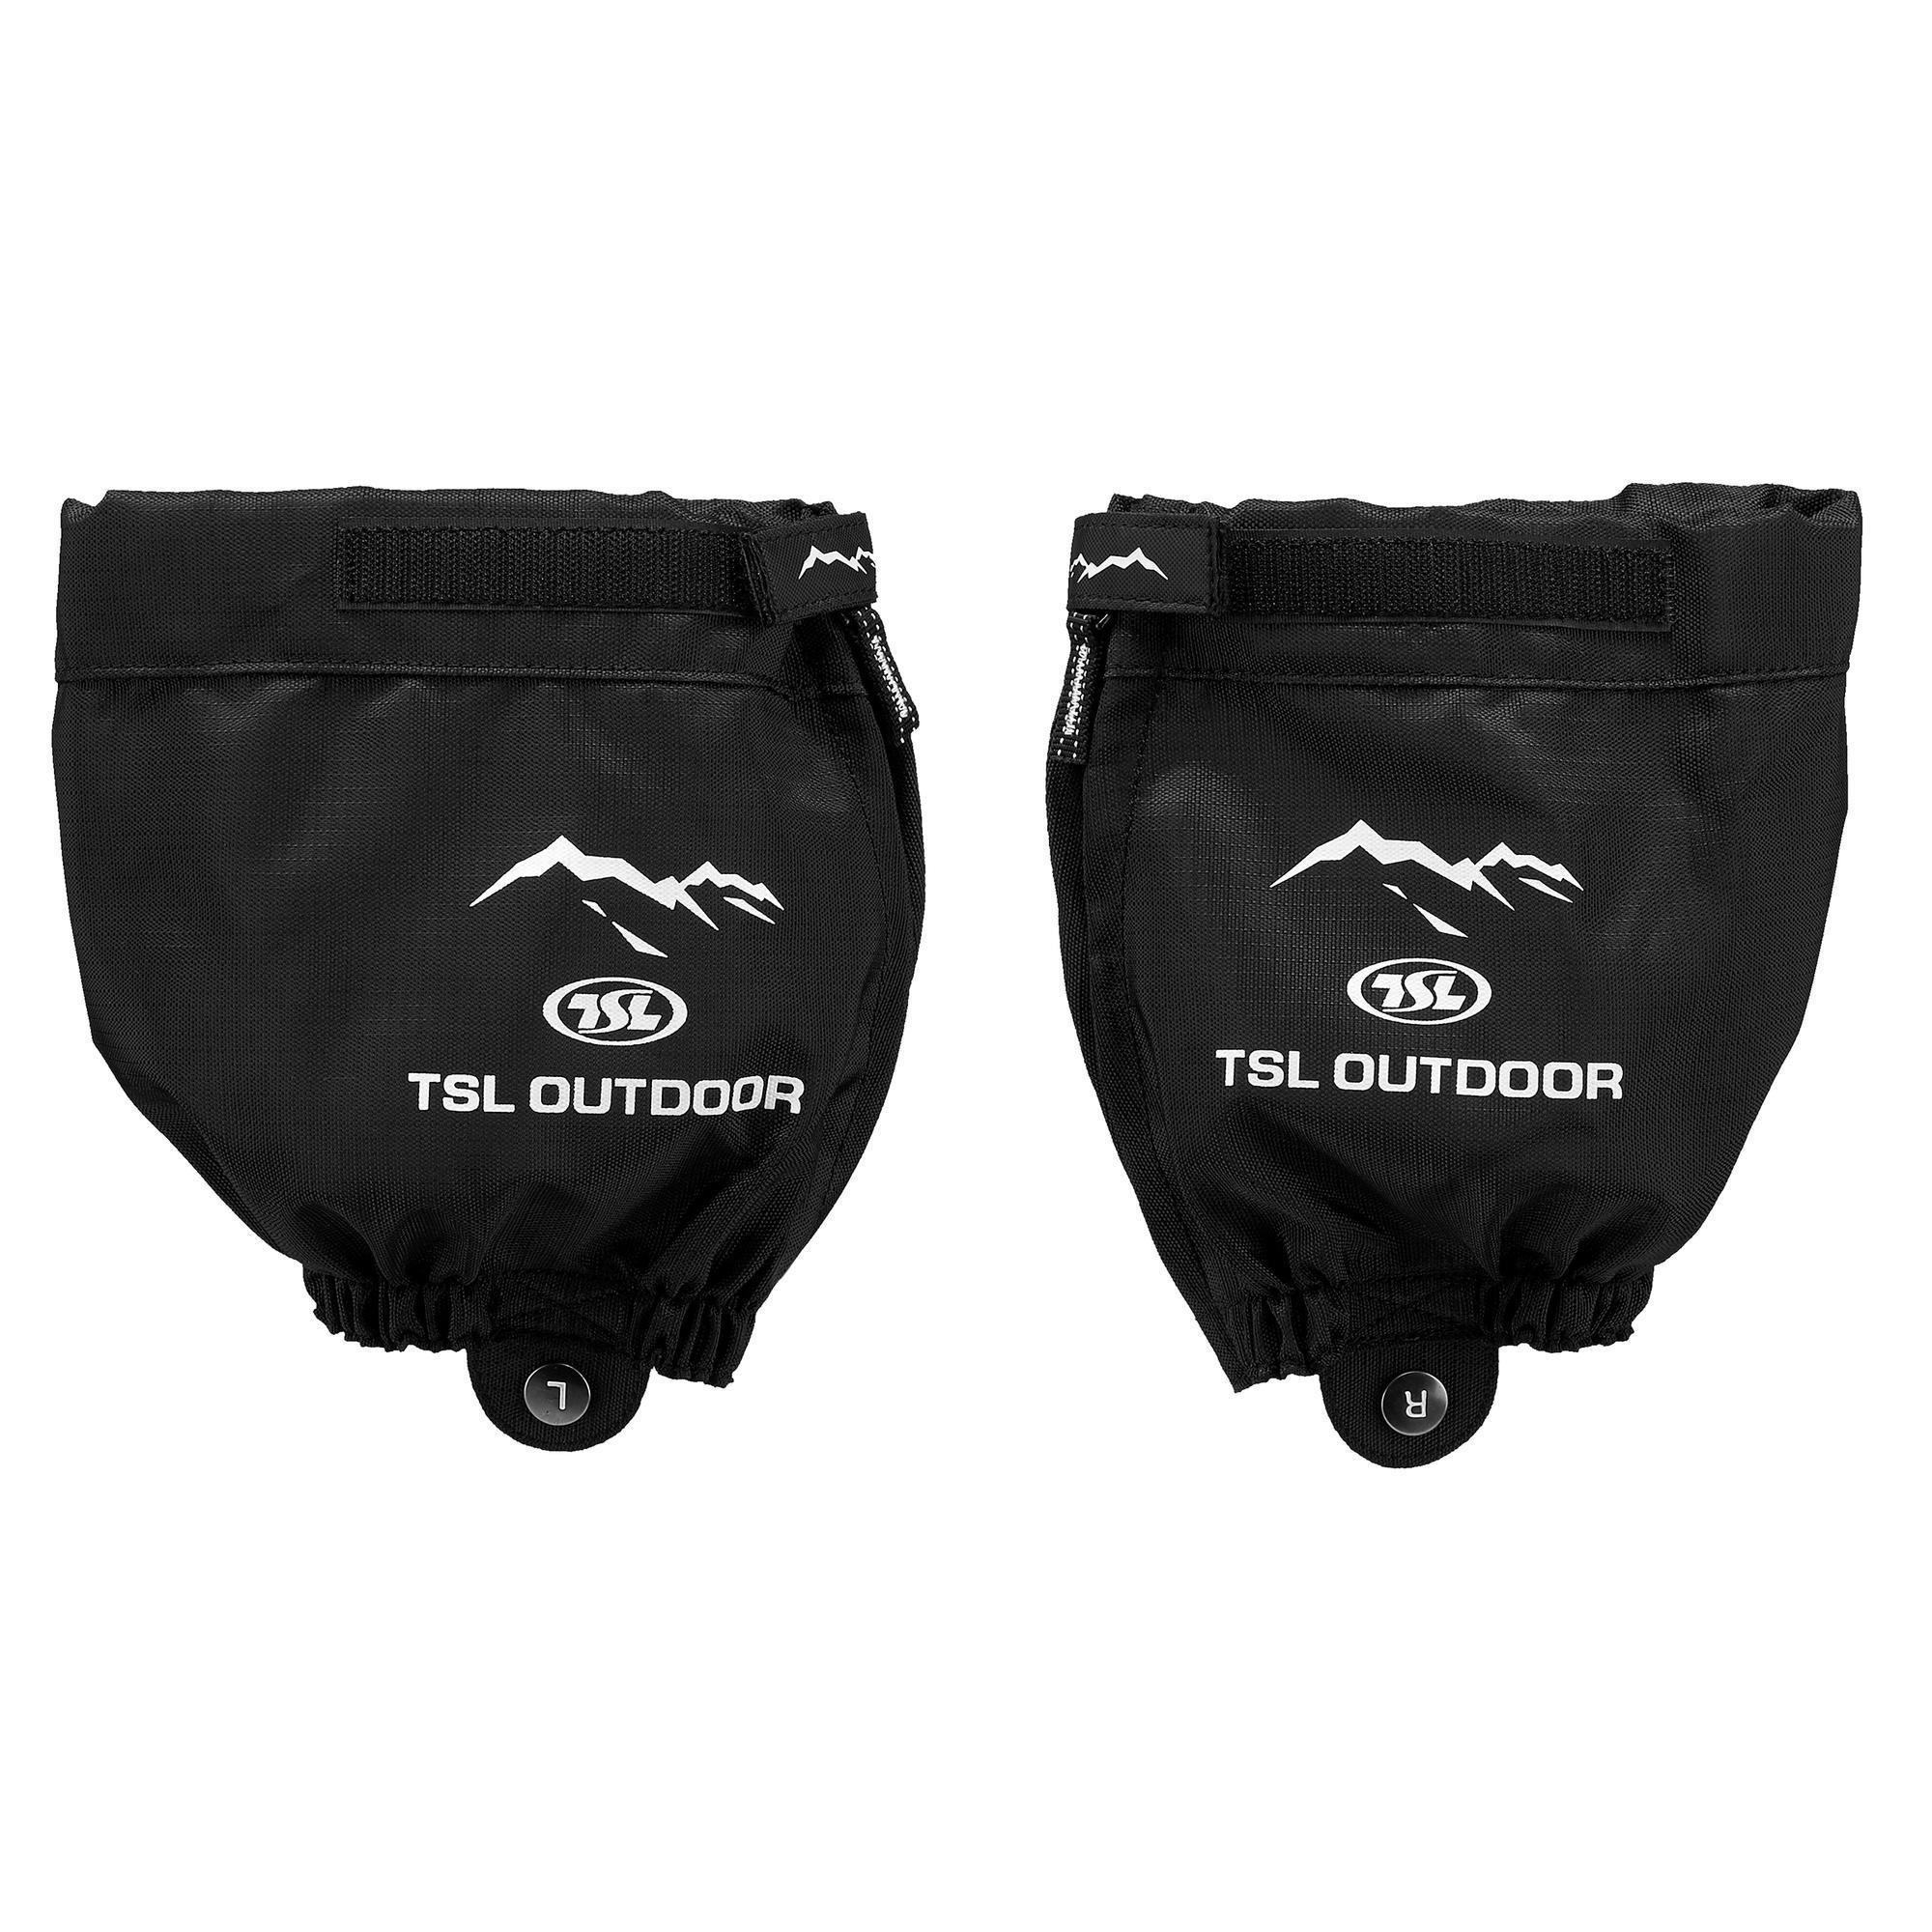 Mini-Gamaschen TSL Outdoor schwarz | Schuhe > Sportschuhe > Gamaschen | Tsl